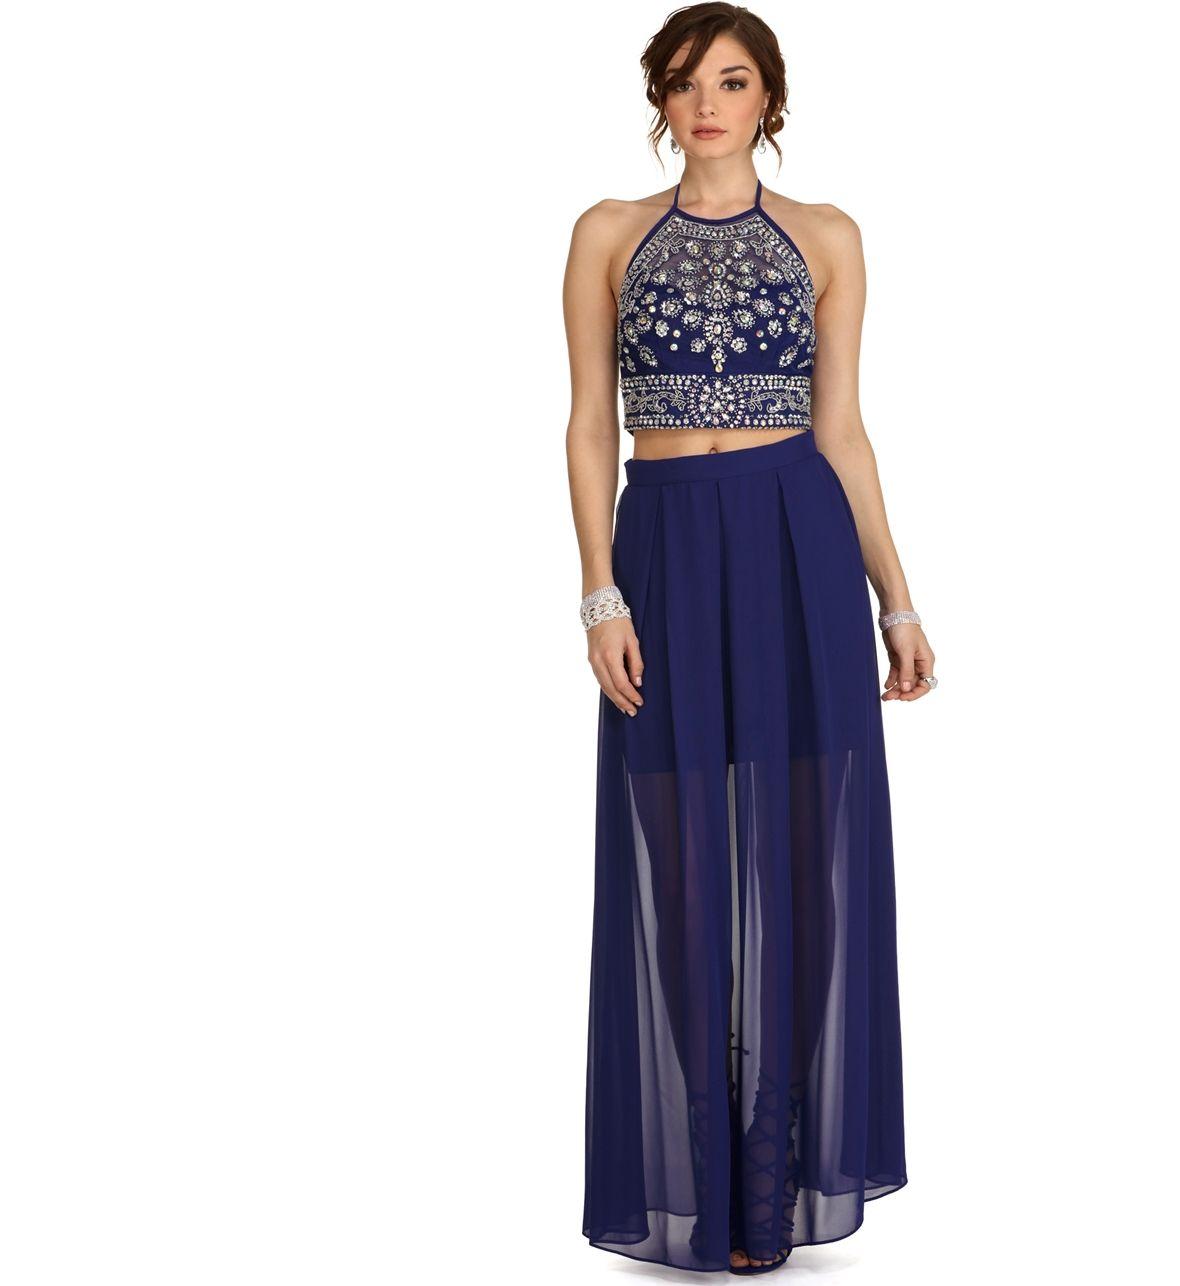 Create an Arabian Nights Theme | My Perfect Quince  |Arabian Nights Theme Party Dress